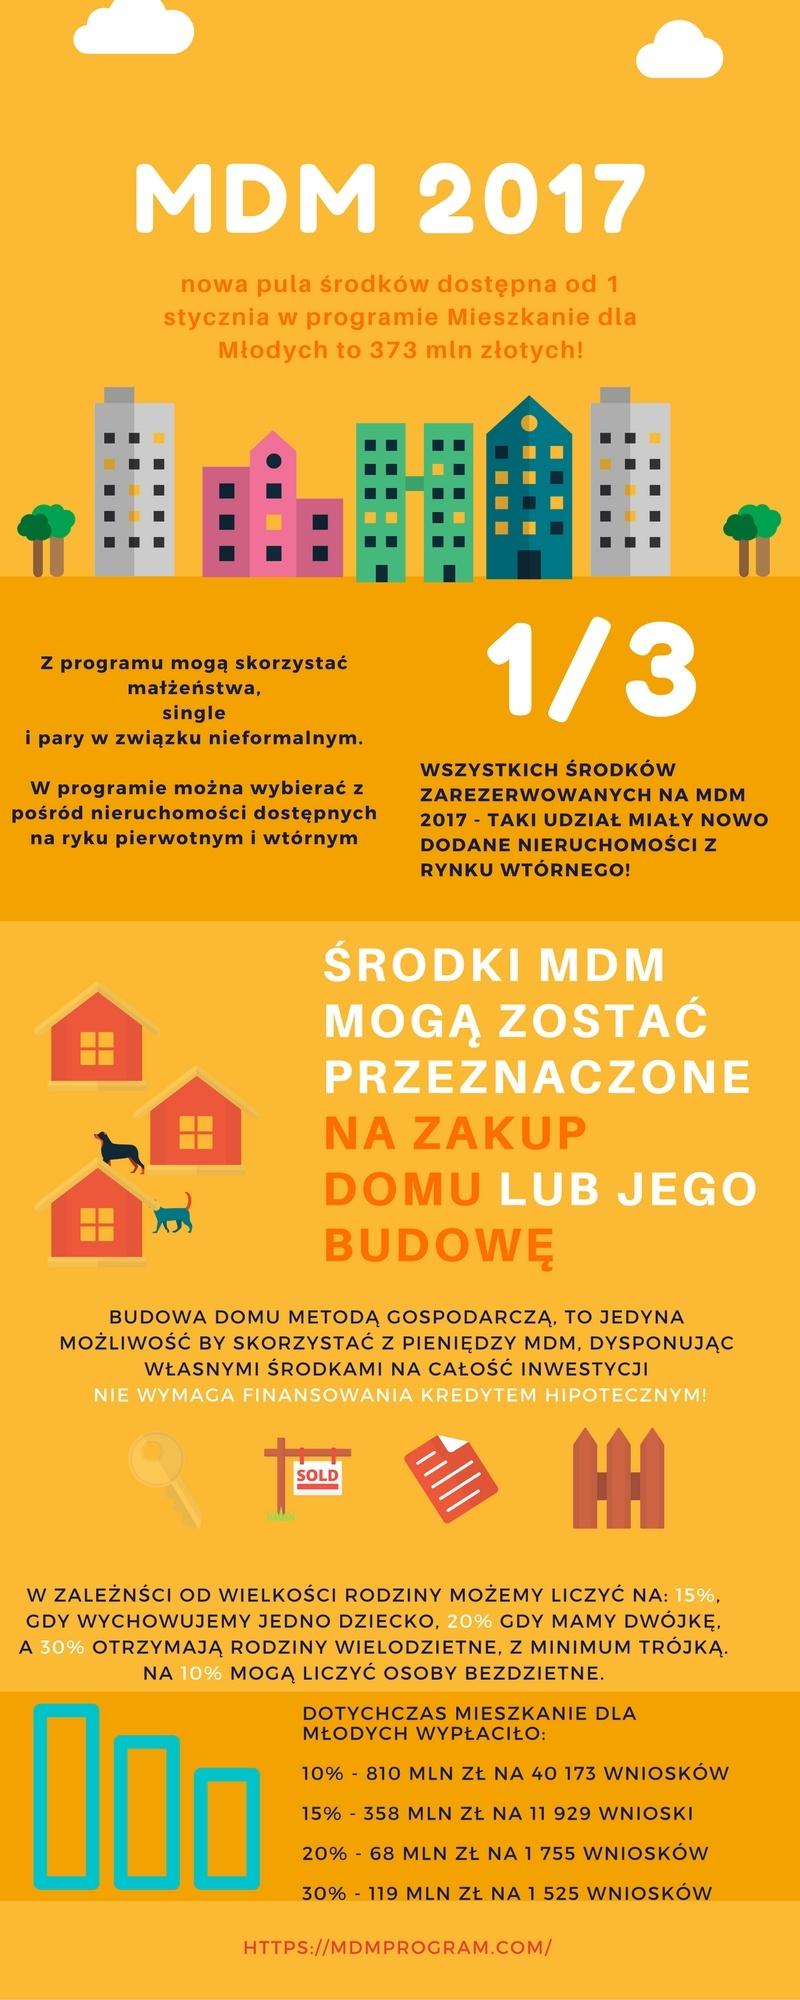 mdm-2017-1